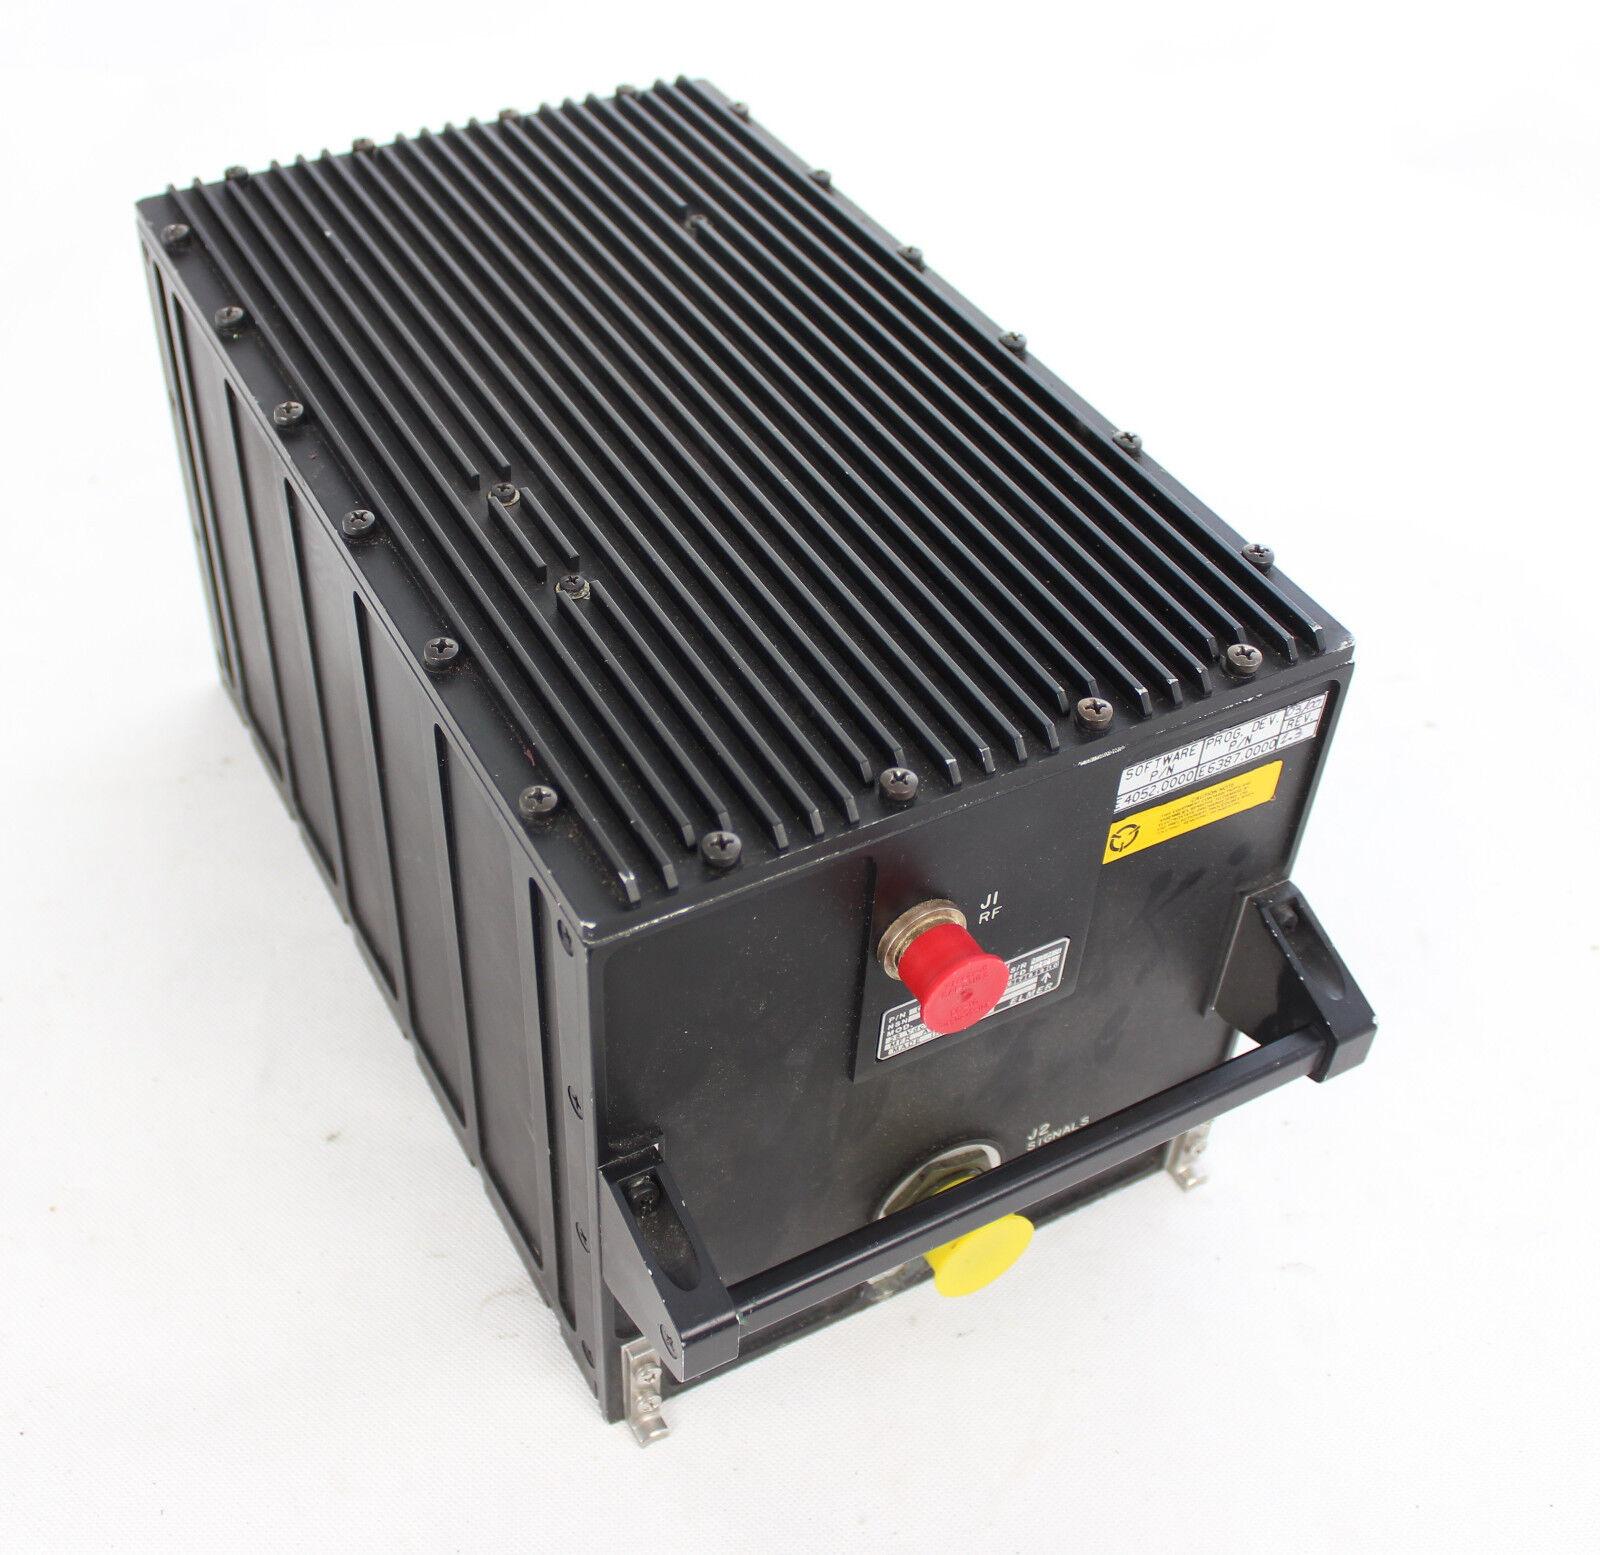 ANTENNA BOX ELMER 28Vdc 5A ATU-1992/LN MFR A3026. Buy it now for 199.00